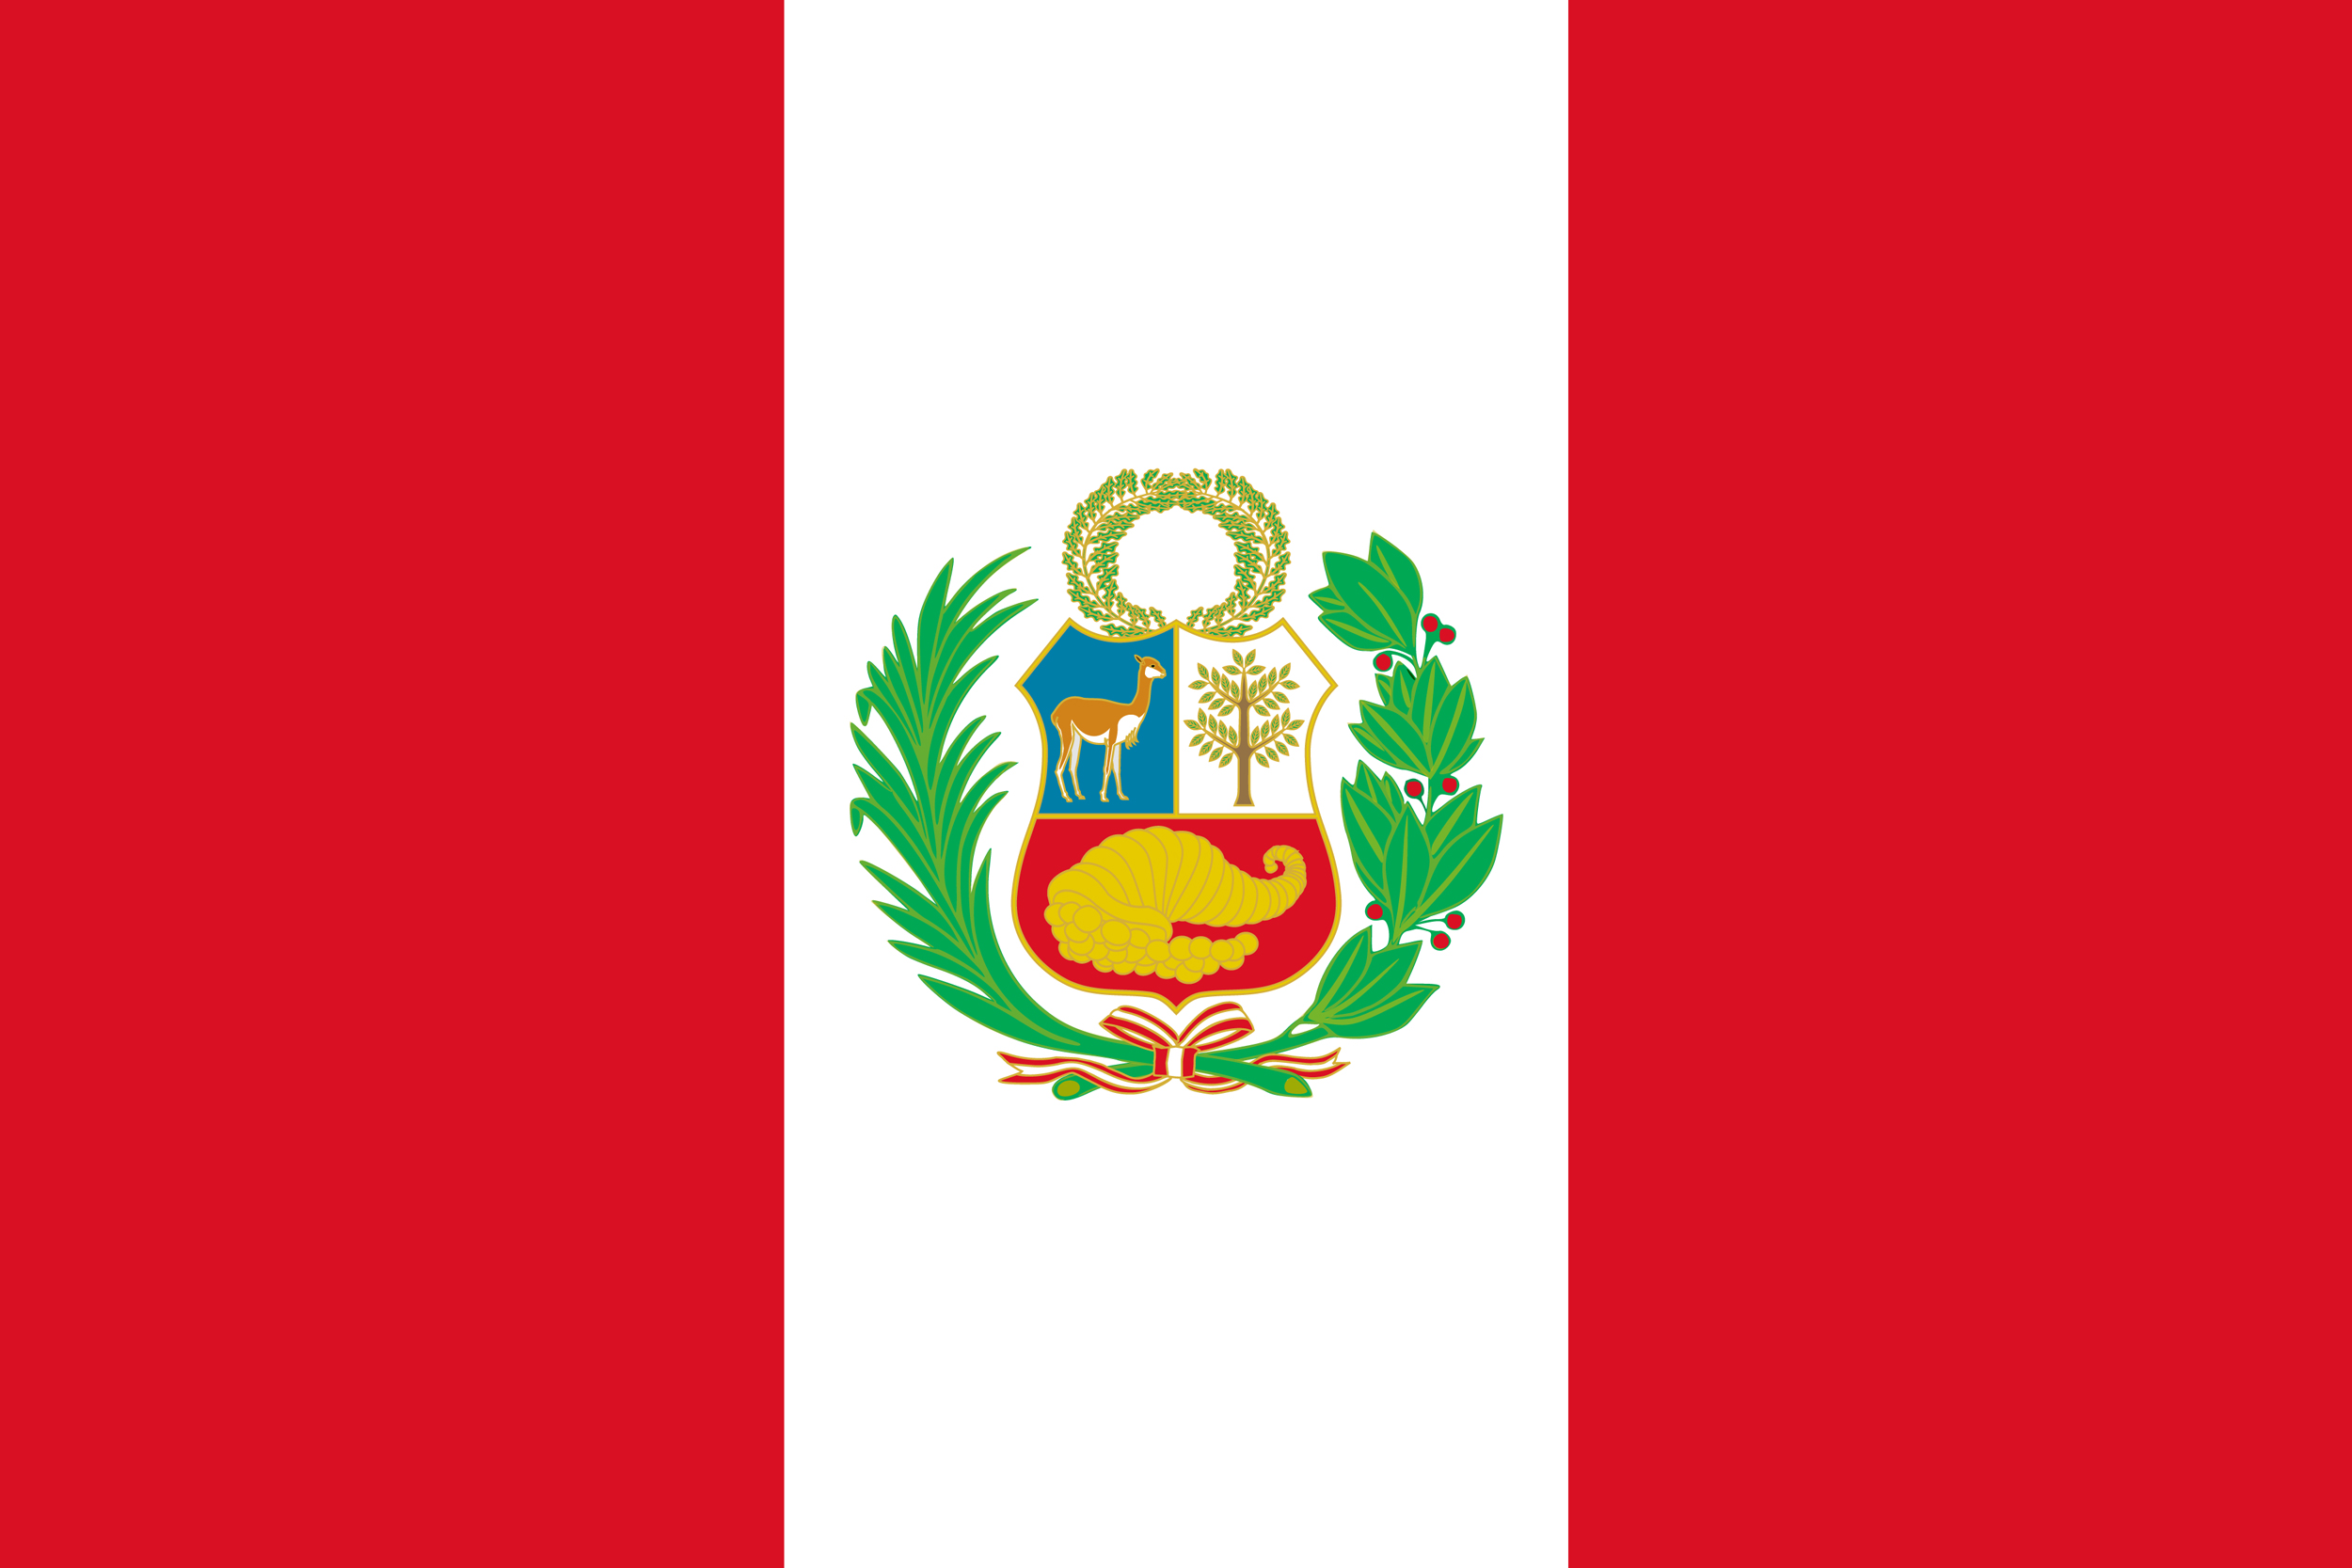 By Republic of Peru - Republica del Perú - National Emblems of Perú - National Flag (State), Public Domain,  https://commons.wikimedia.org/w/index.php?curid=537393